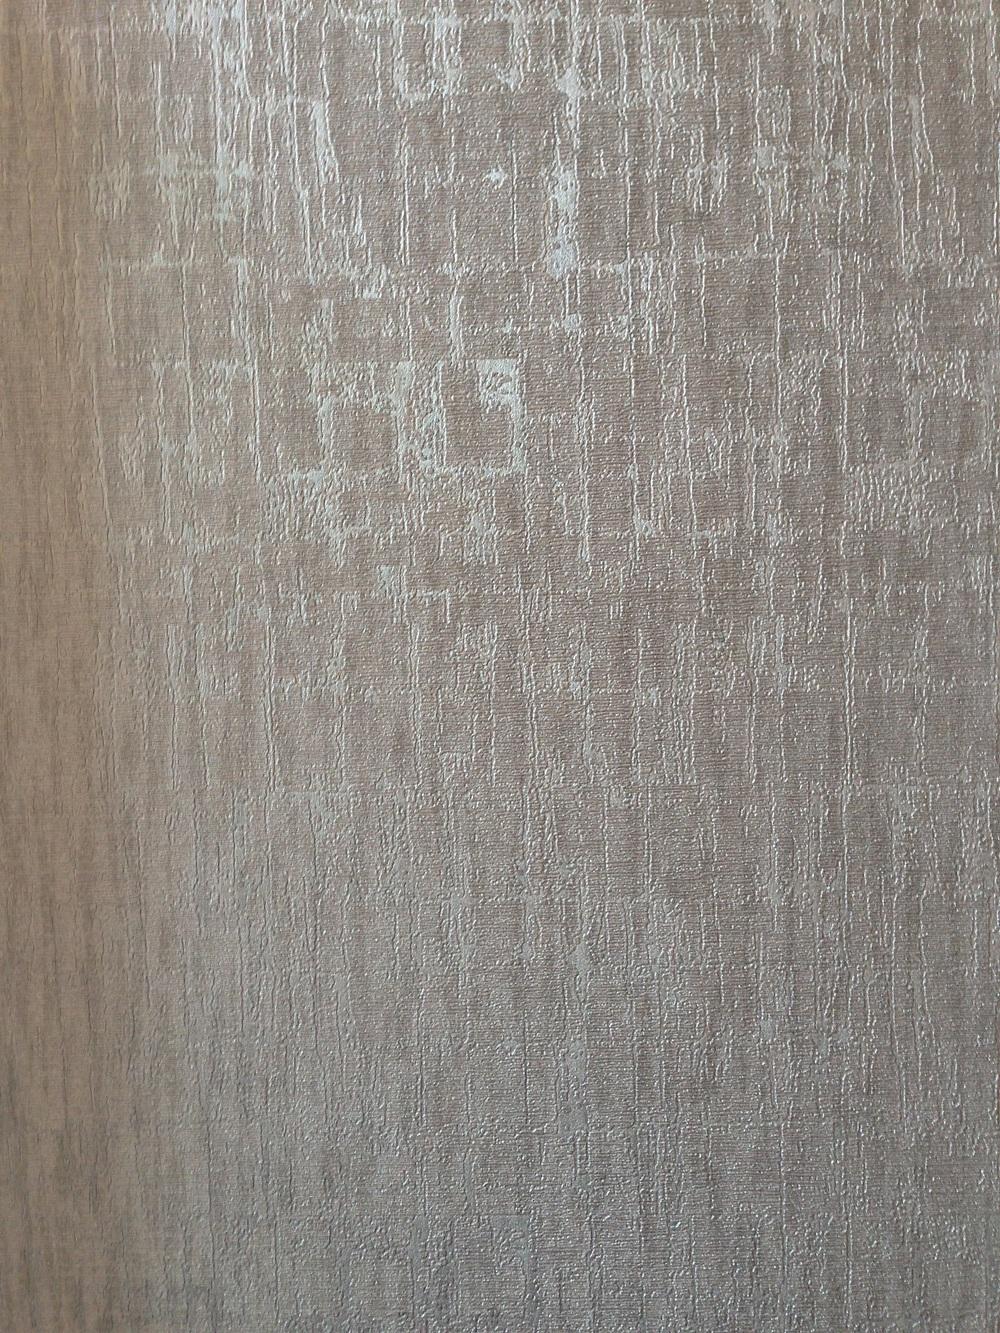 abwaschbare tapeten korea vinyl tapete mit orchideen. Black Bedroom Furniture Sets. Home Design Ideas